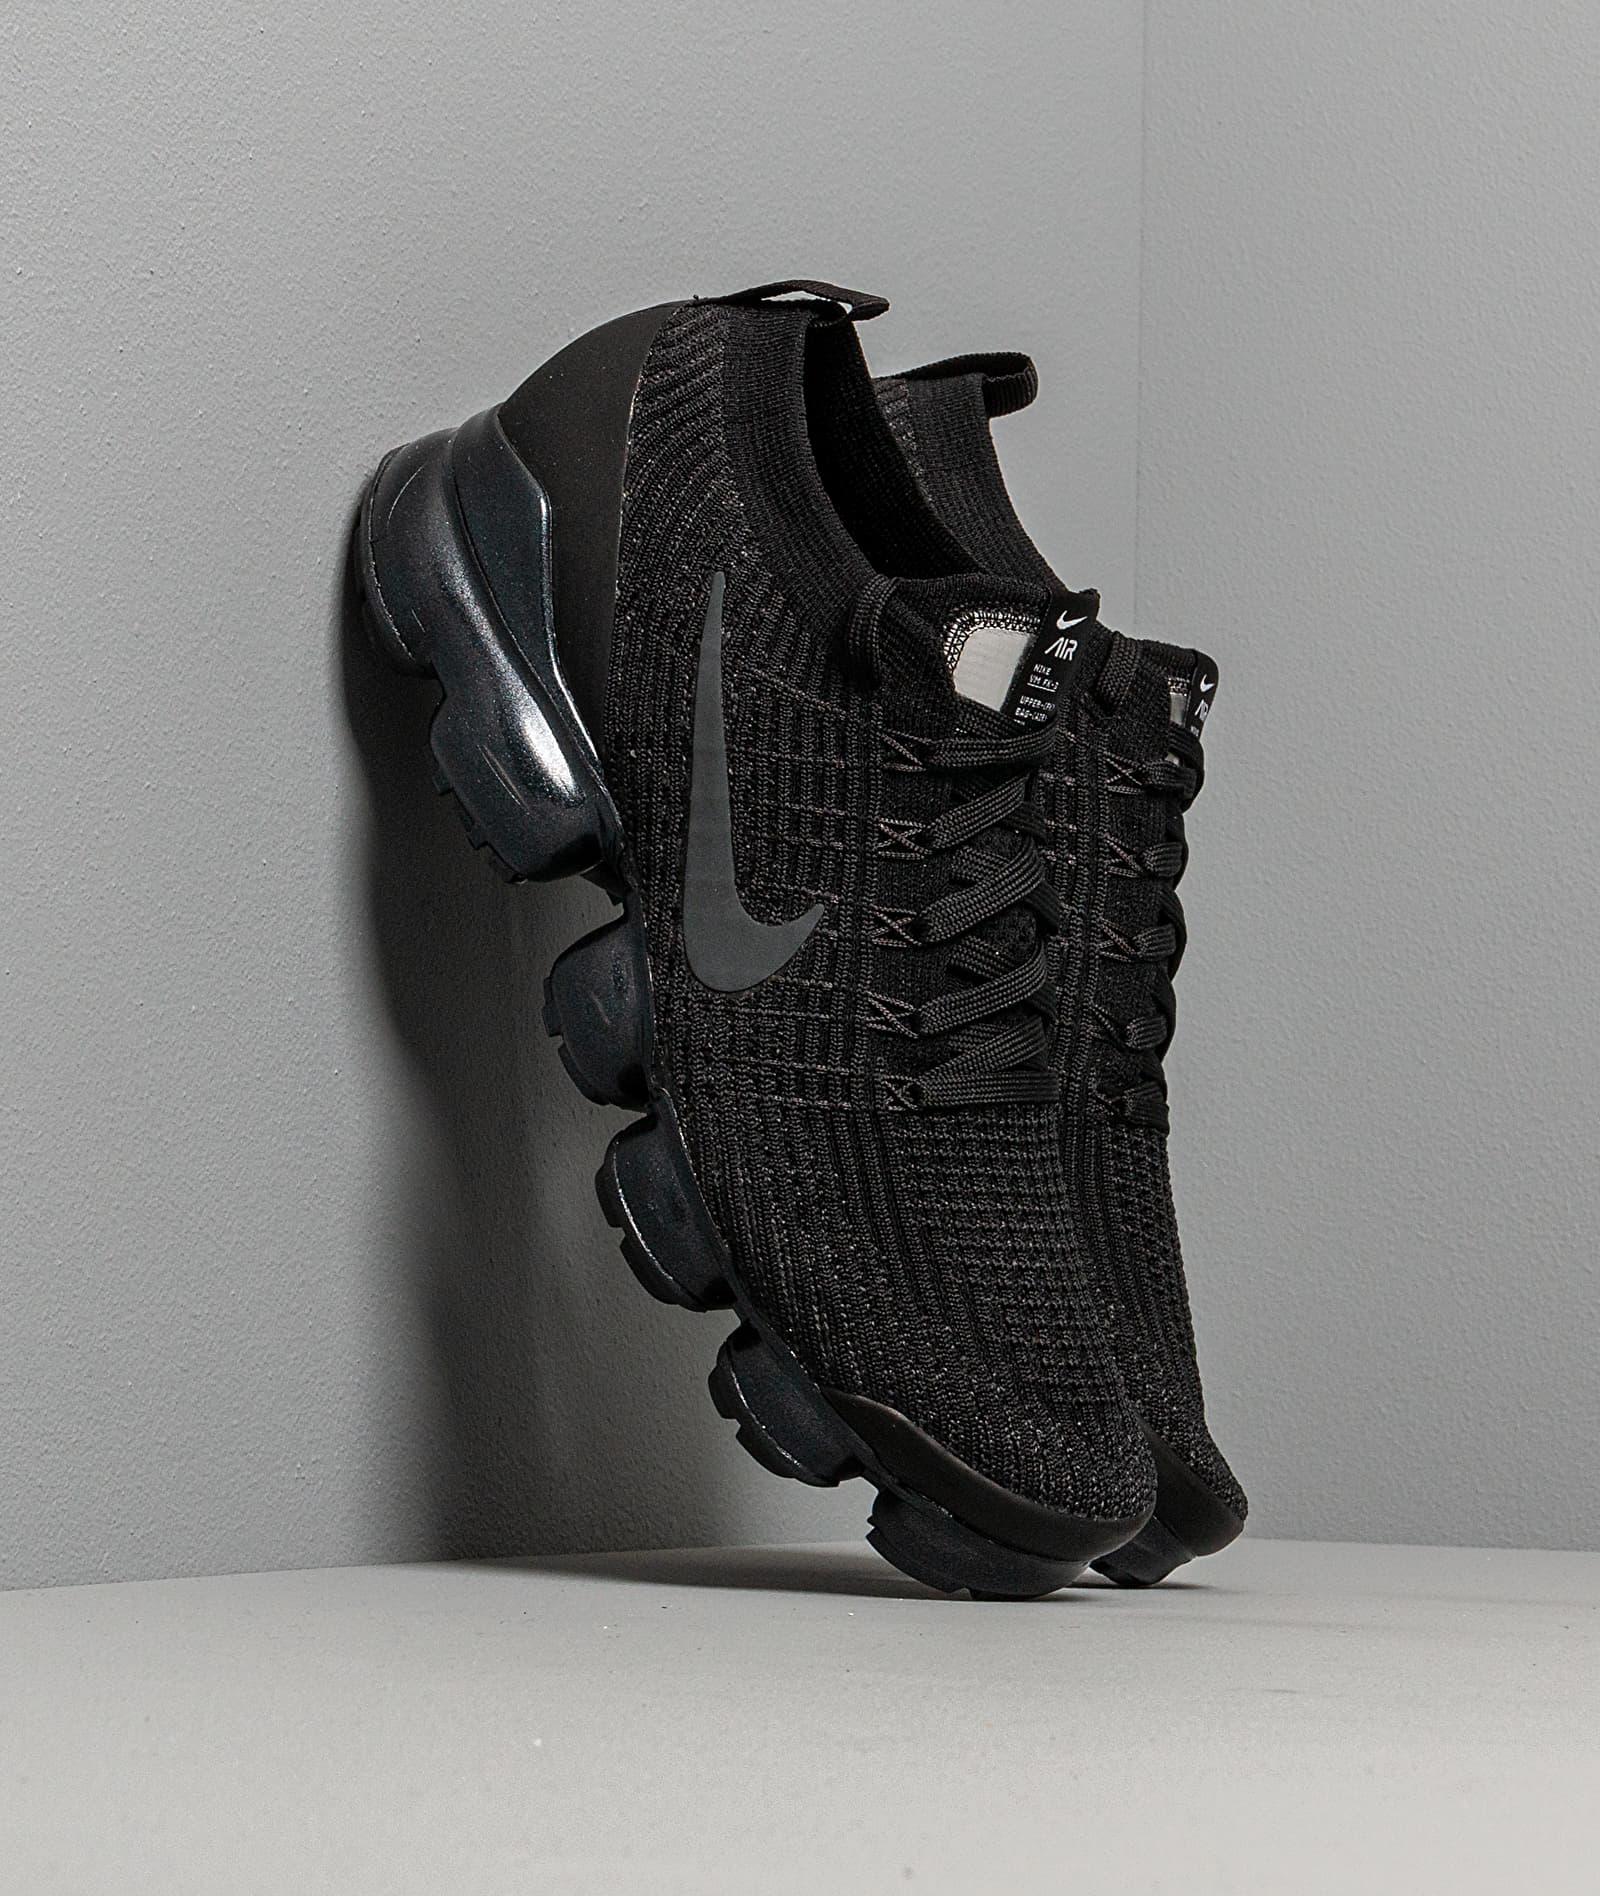 Nike Air Vapormax Flyknit 3 Black/ Anthracite-White-Metallic Silver AJ6900-004